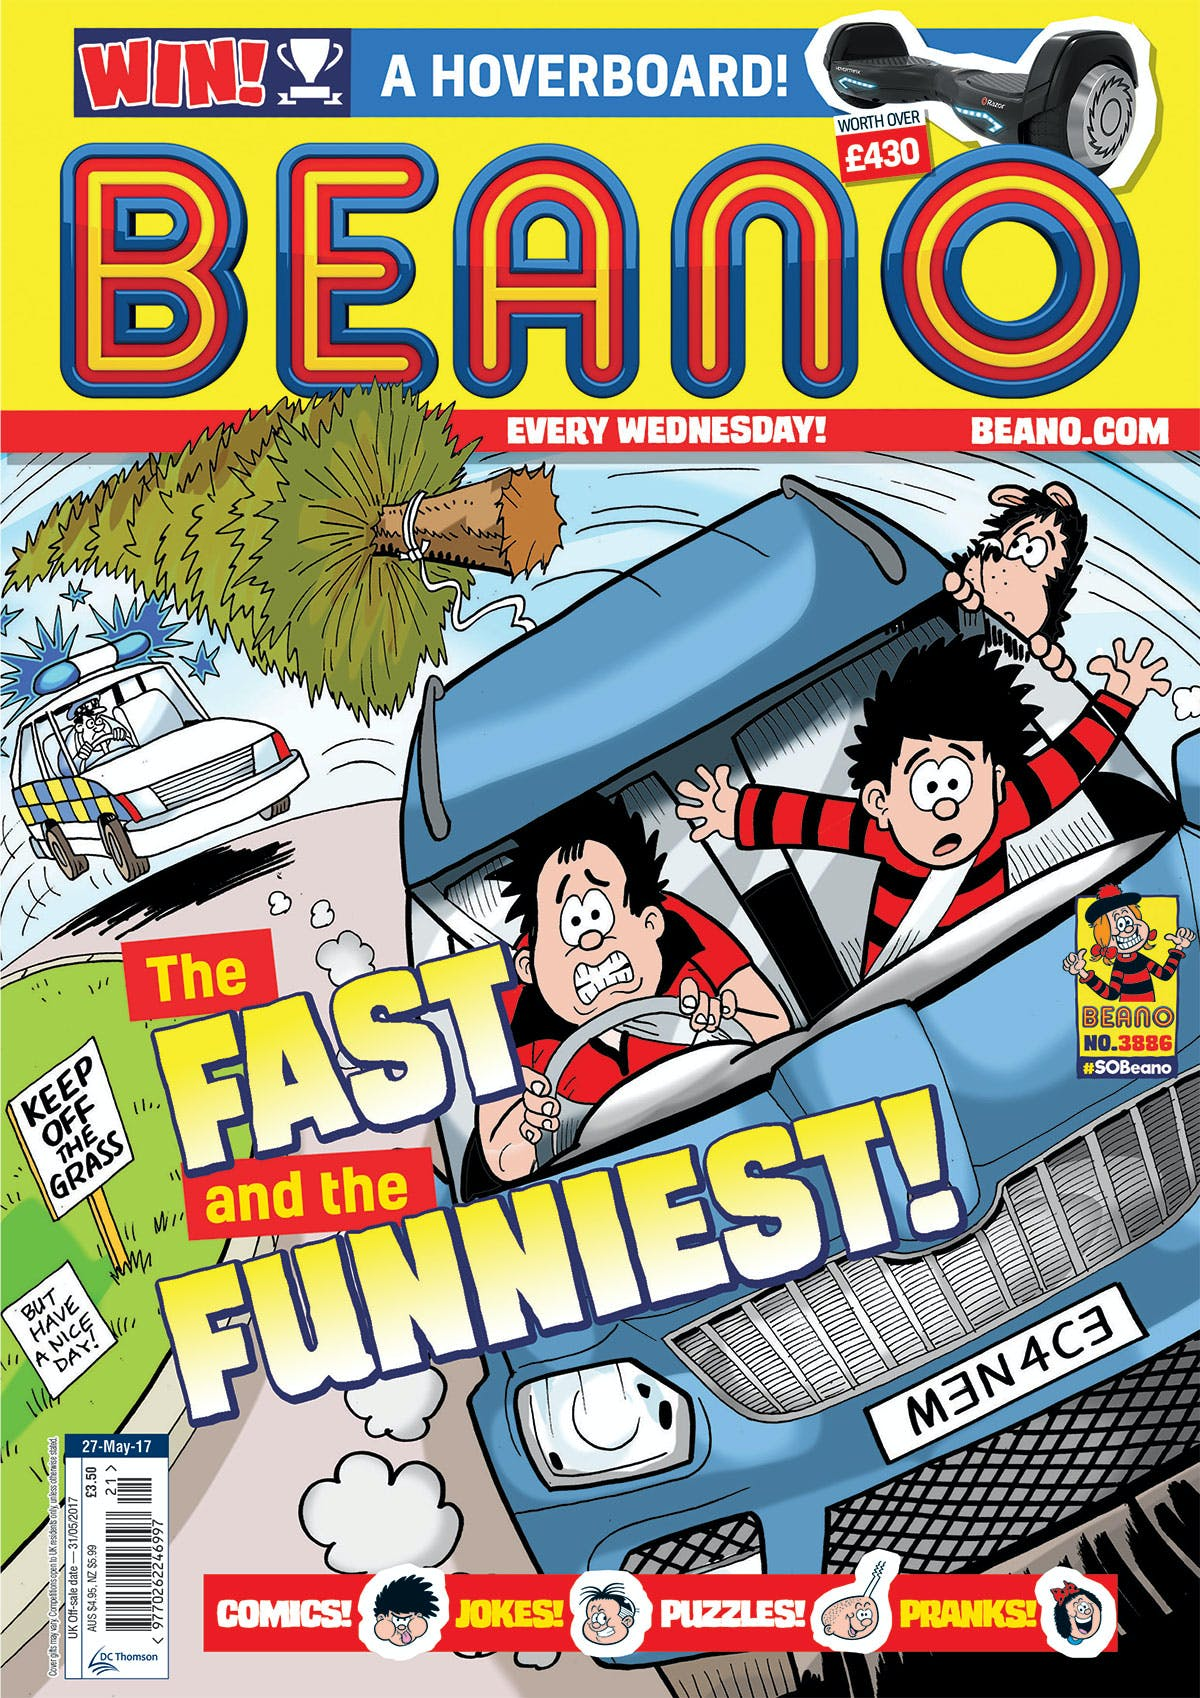 Beano 3886 cover, 27.5.17